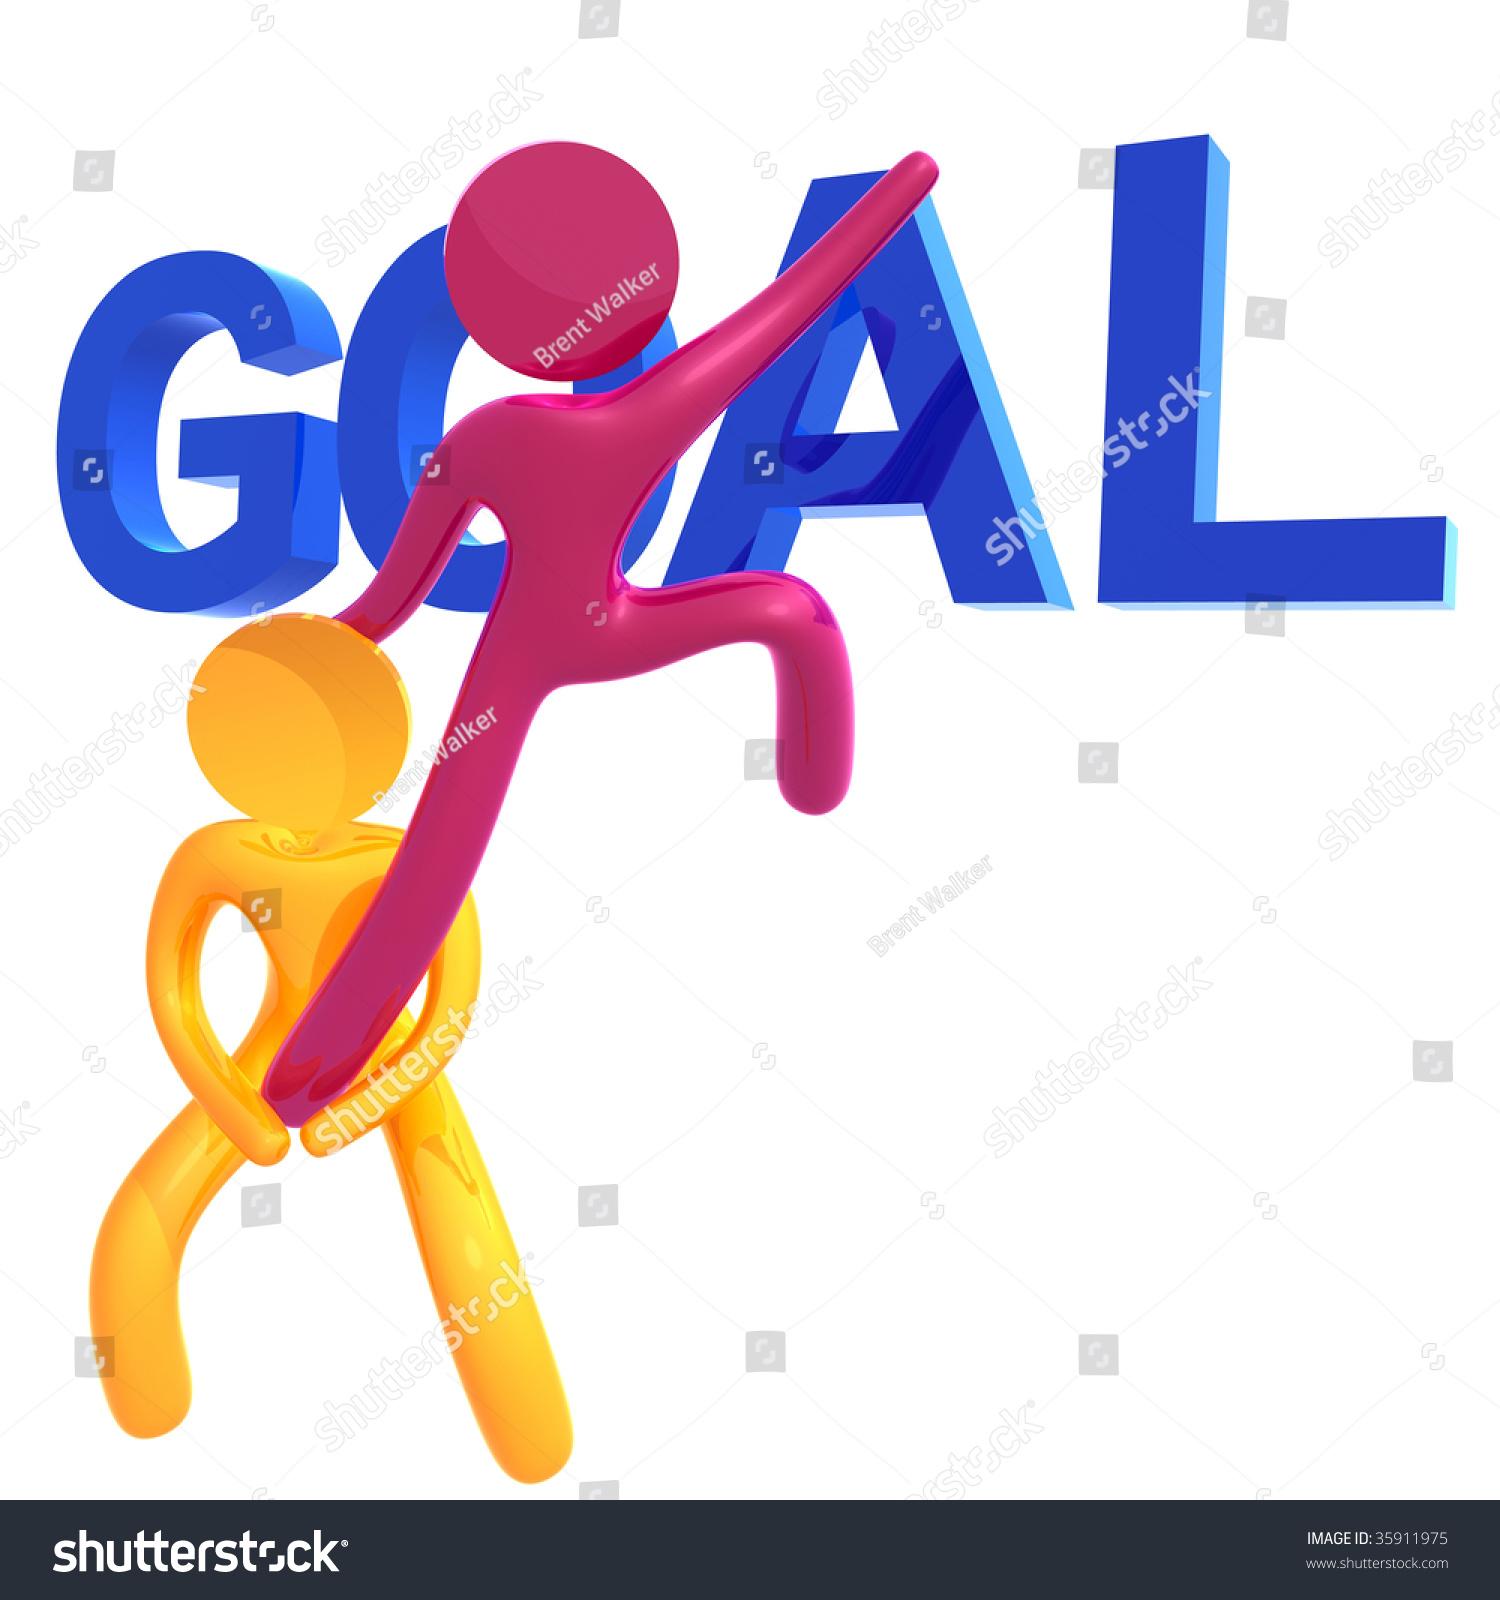 Helping Friend To Achieve Goals 3d Orange Pictogram Icon Stock Photo 35911975 : Shutterstock